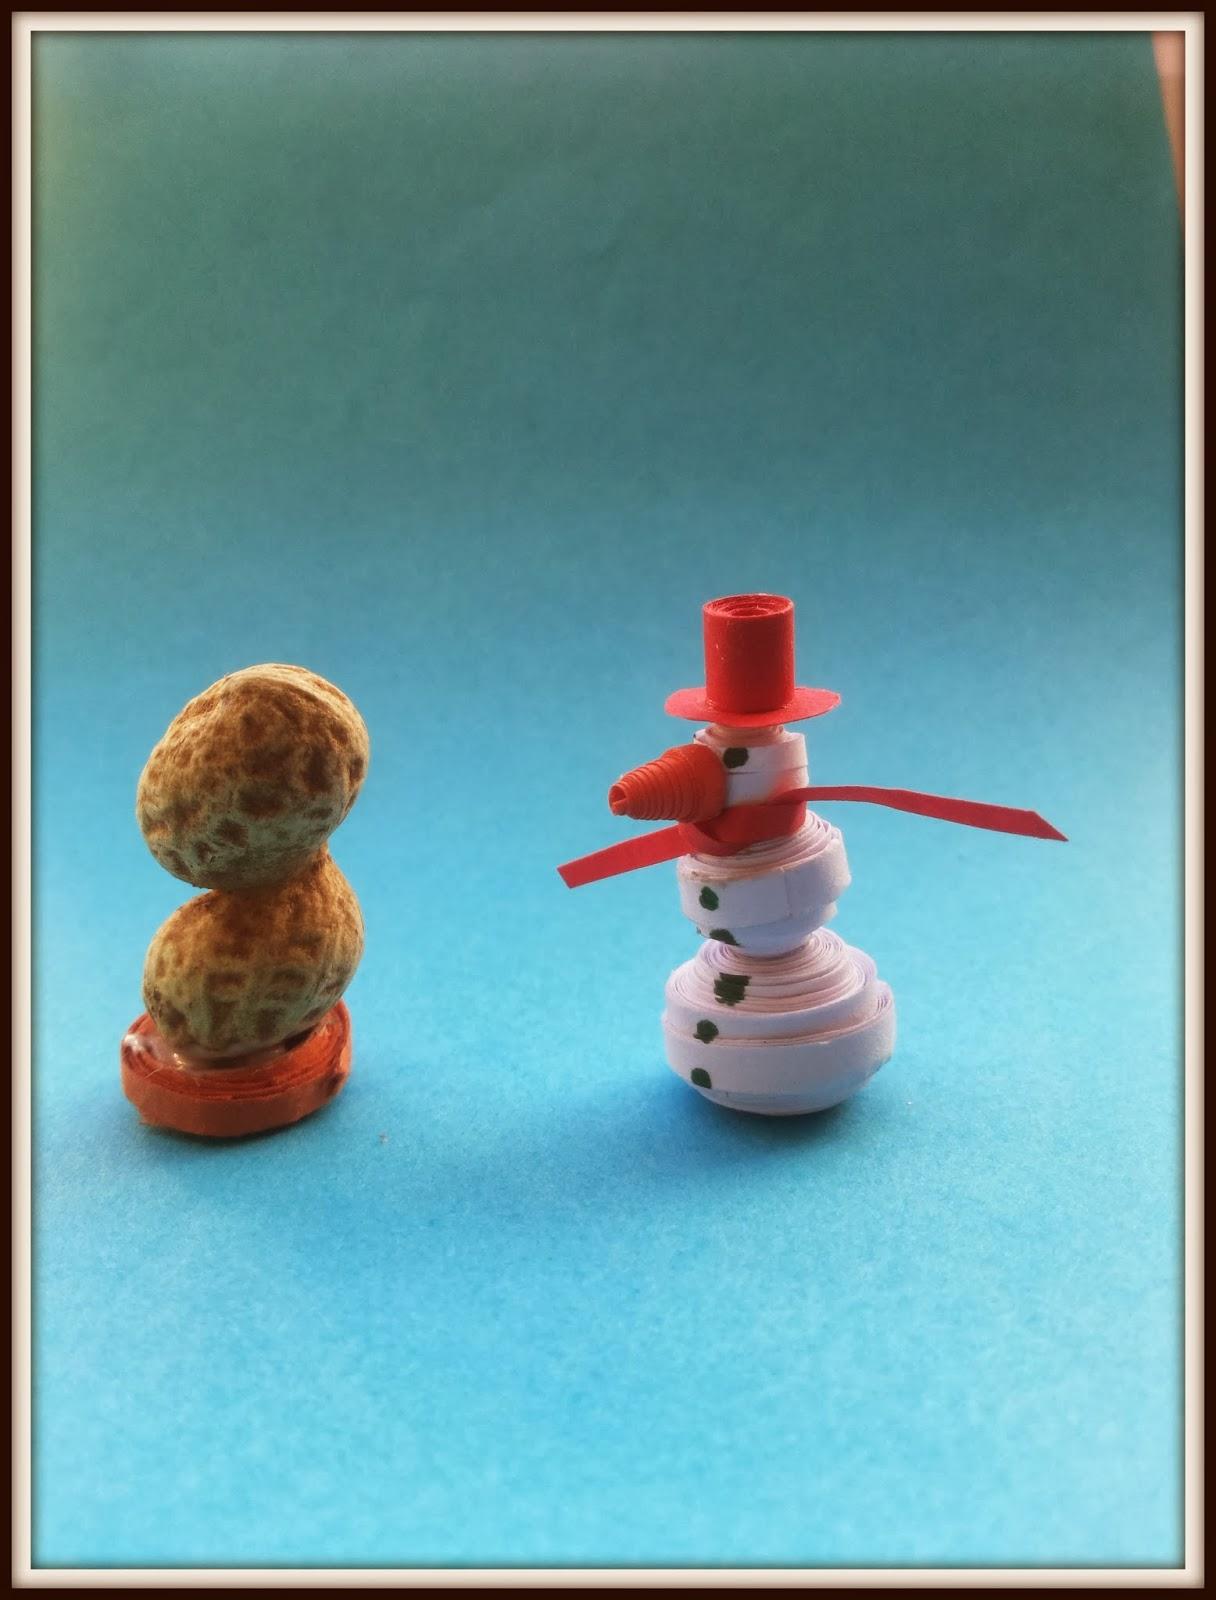 http://quillingzone.blogspot.tw/2014/02/3d-miniature-snow-man.html